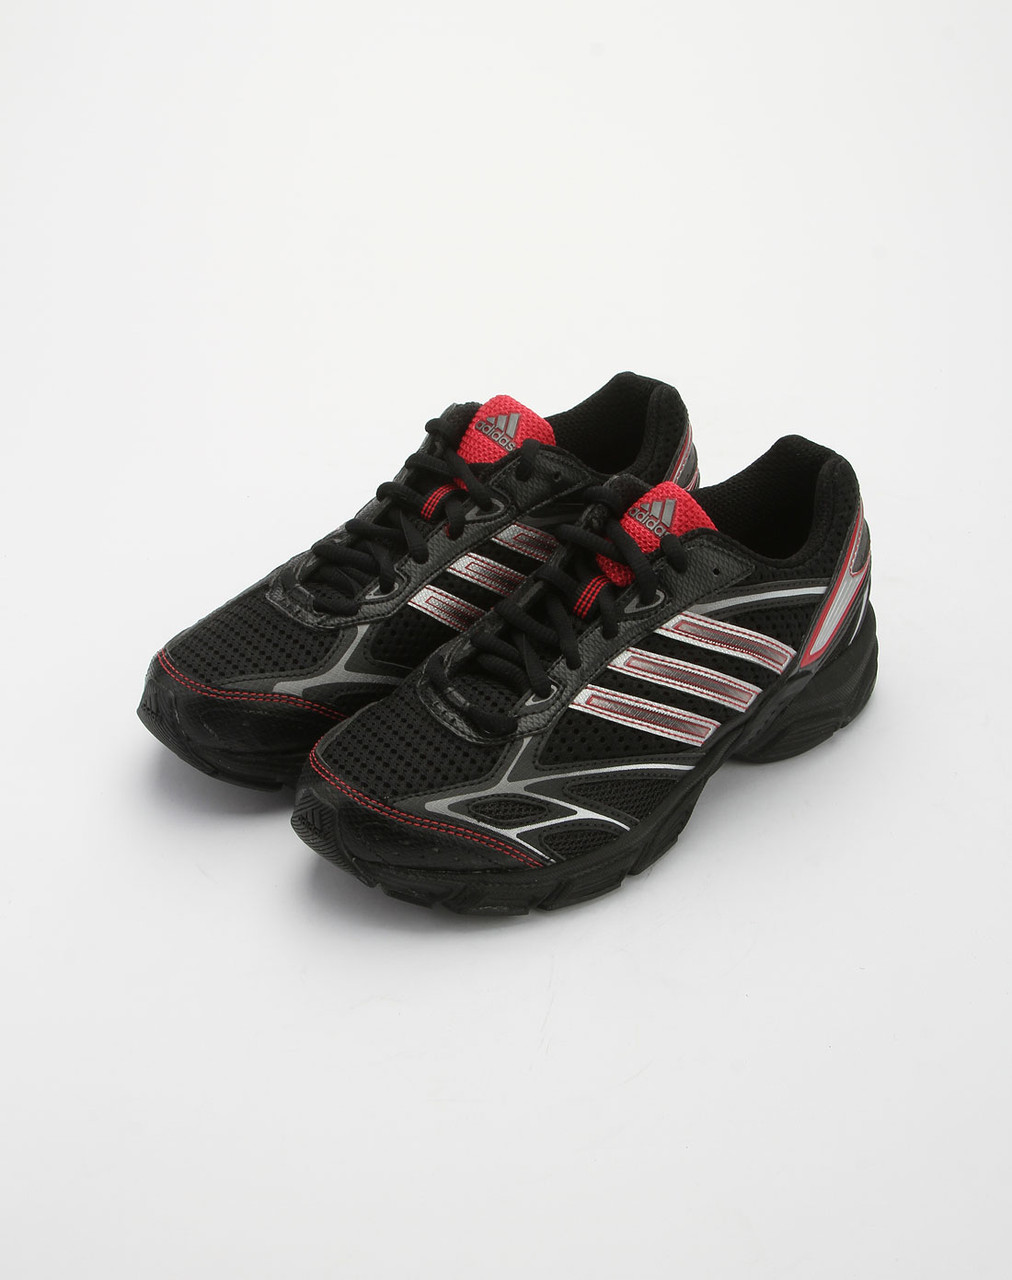 Adidas G16422